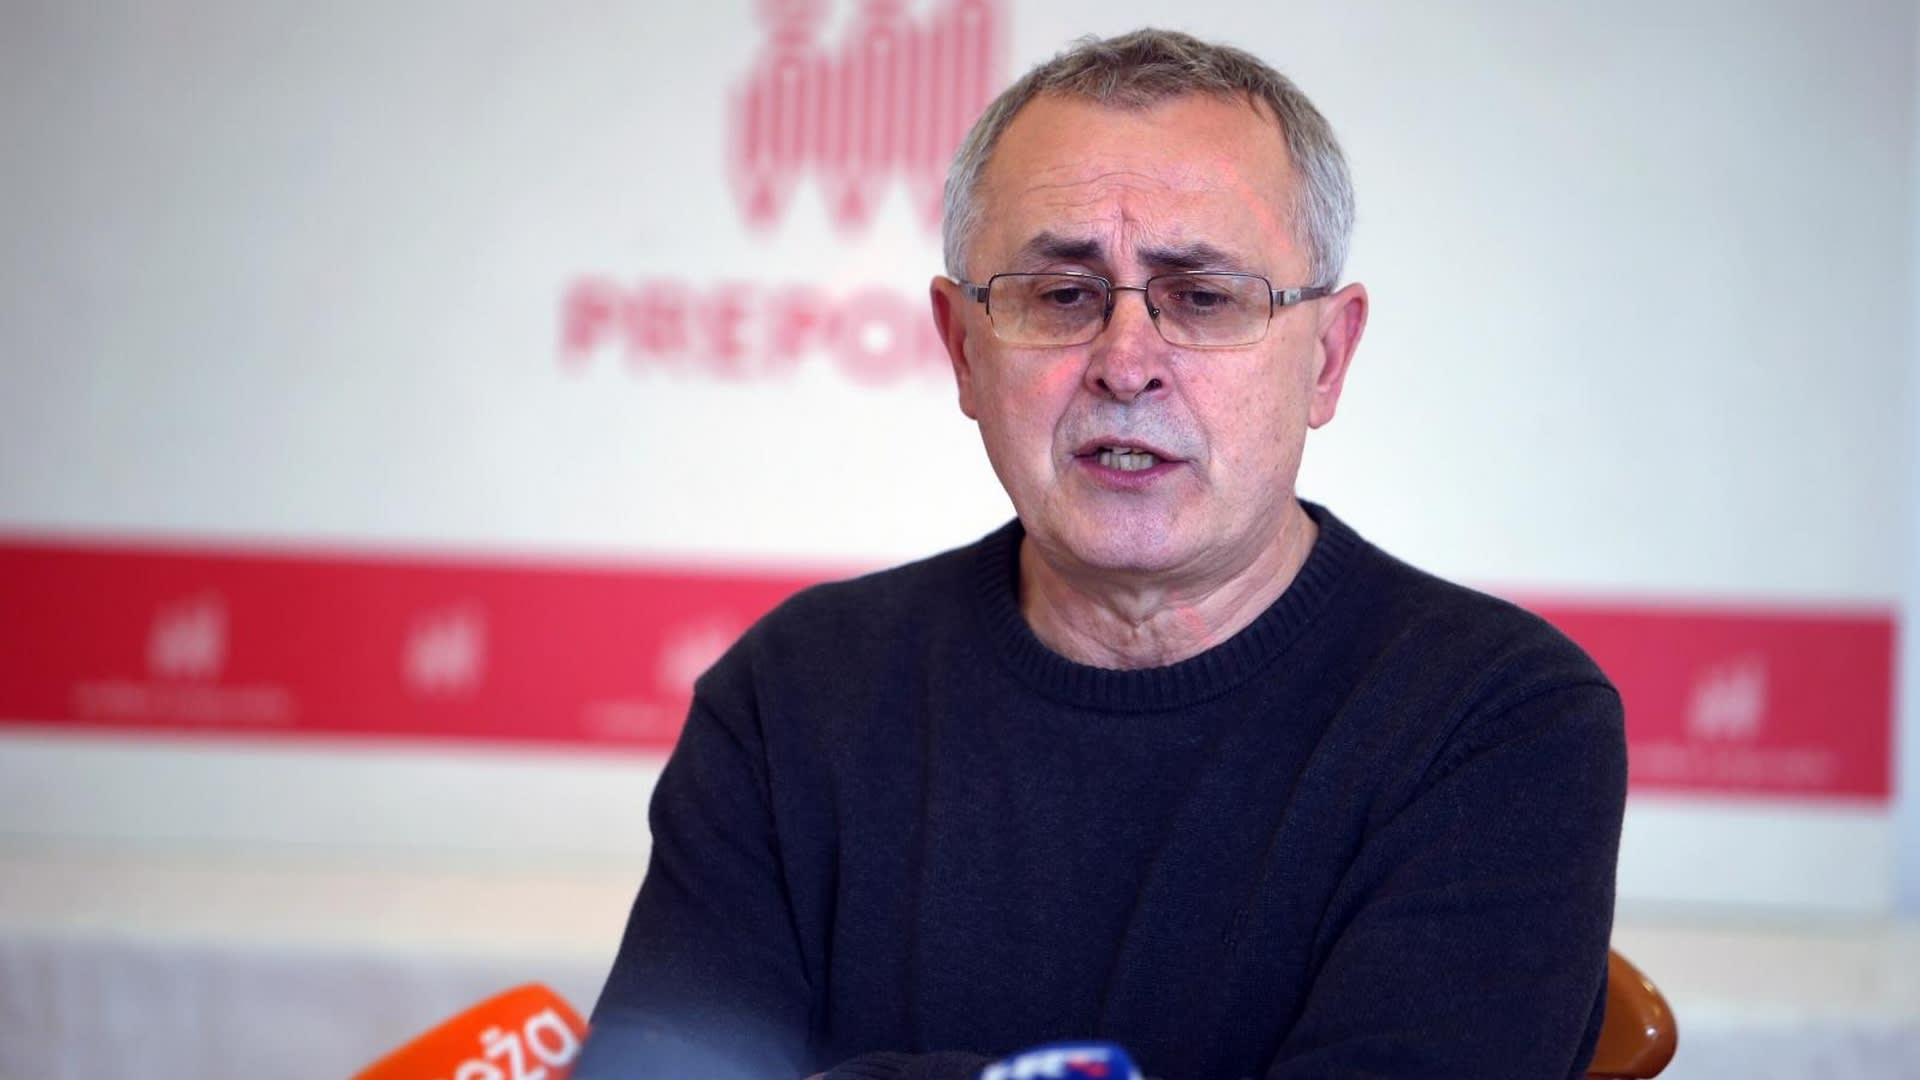 Sindicalista Željko Stipić de Preporod. (Foto: Ivo Cagalj/PIXSELL)